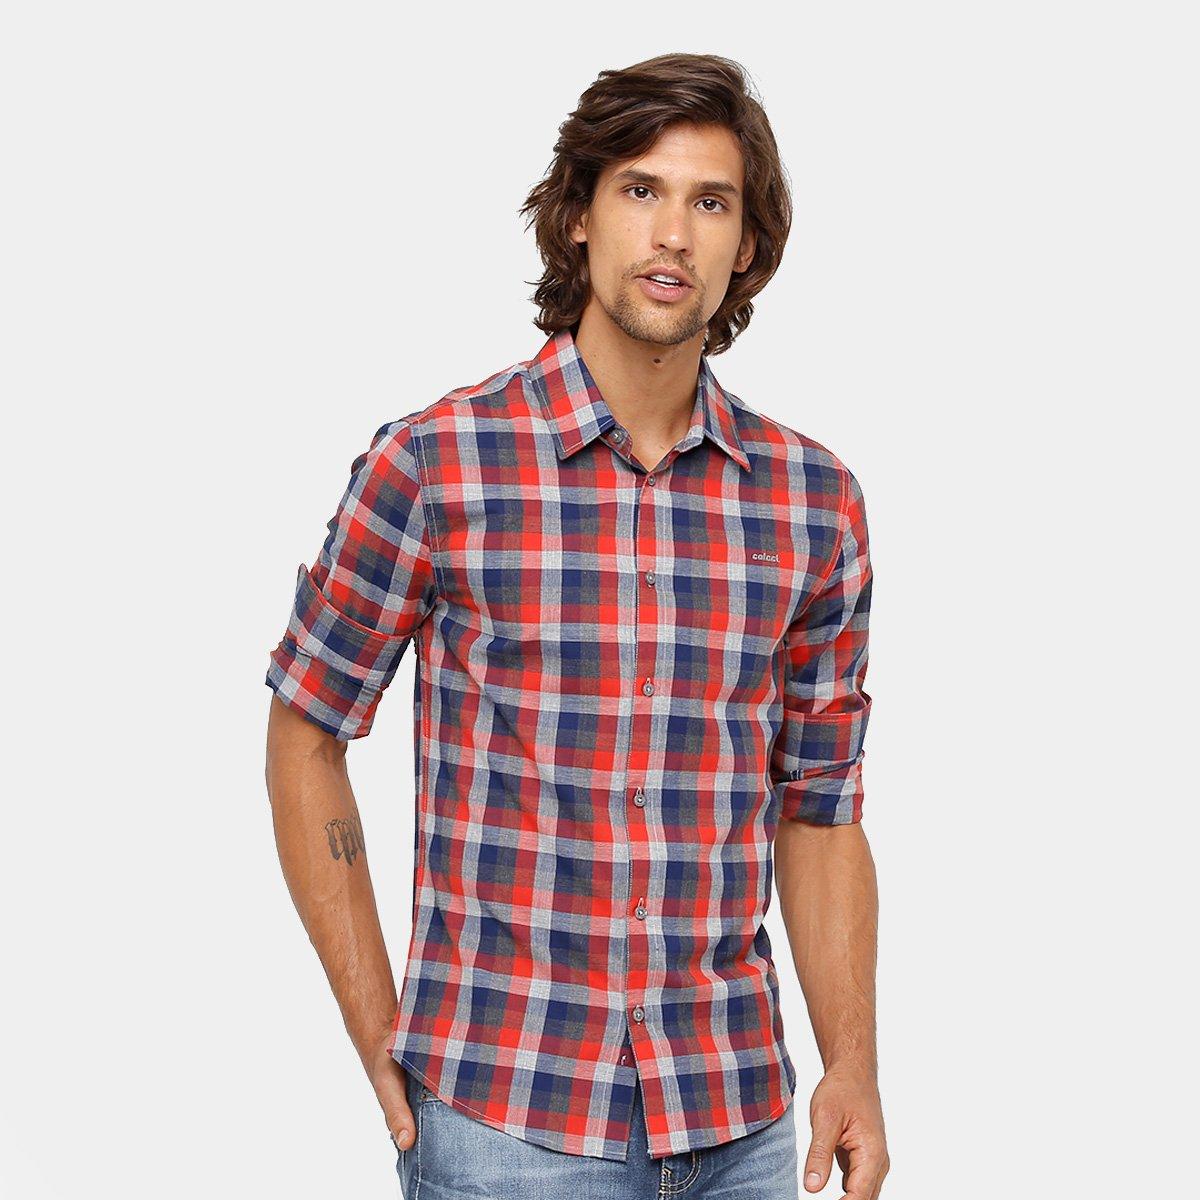 Camisa Xadrez Colcci Manga Longa Masculina - Compre Agora  e6d423dfec3c2